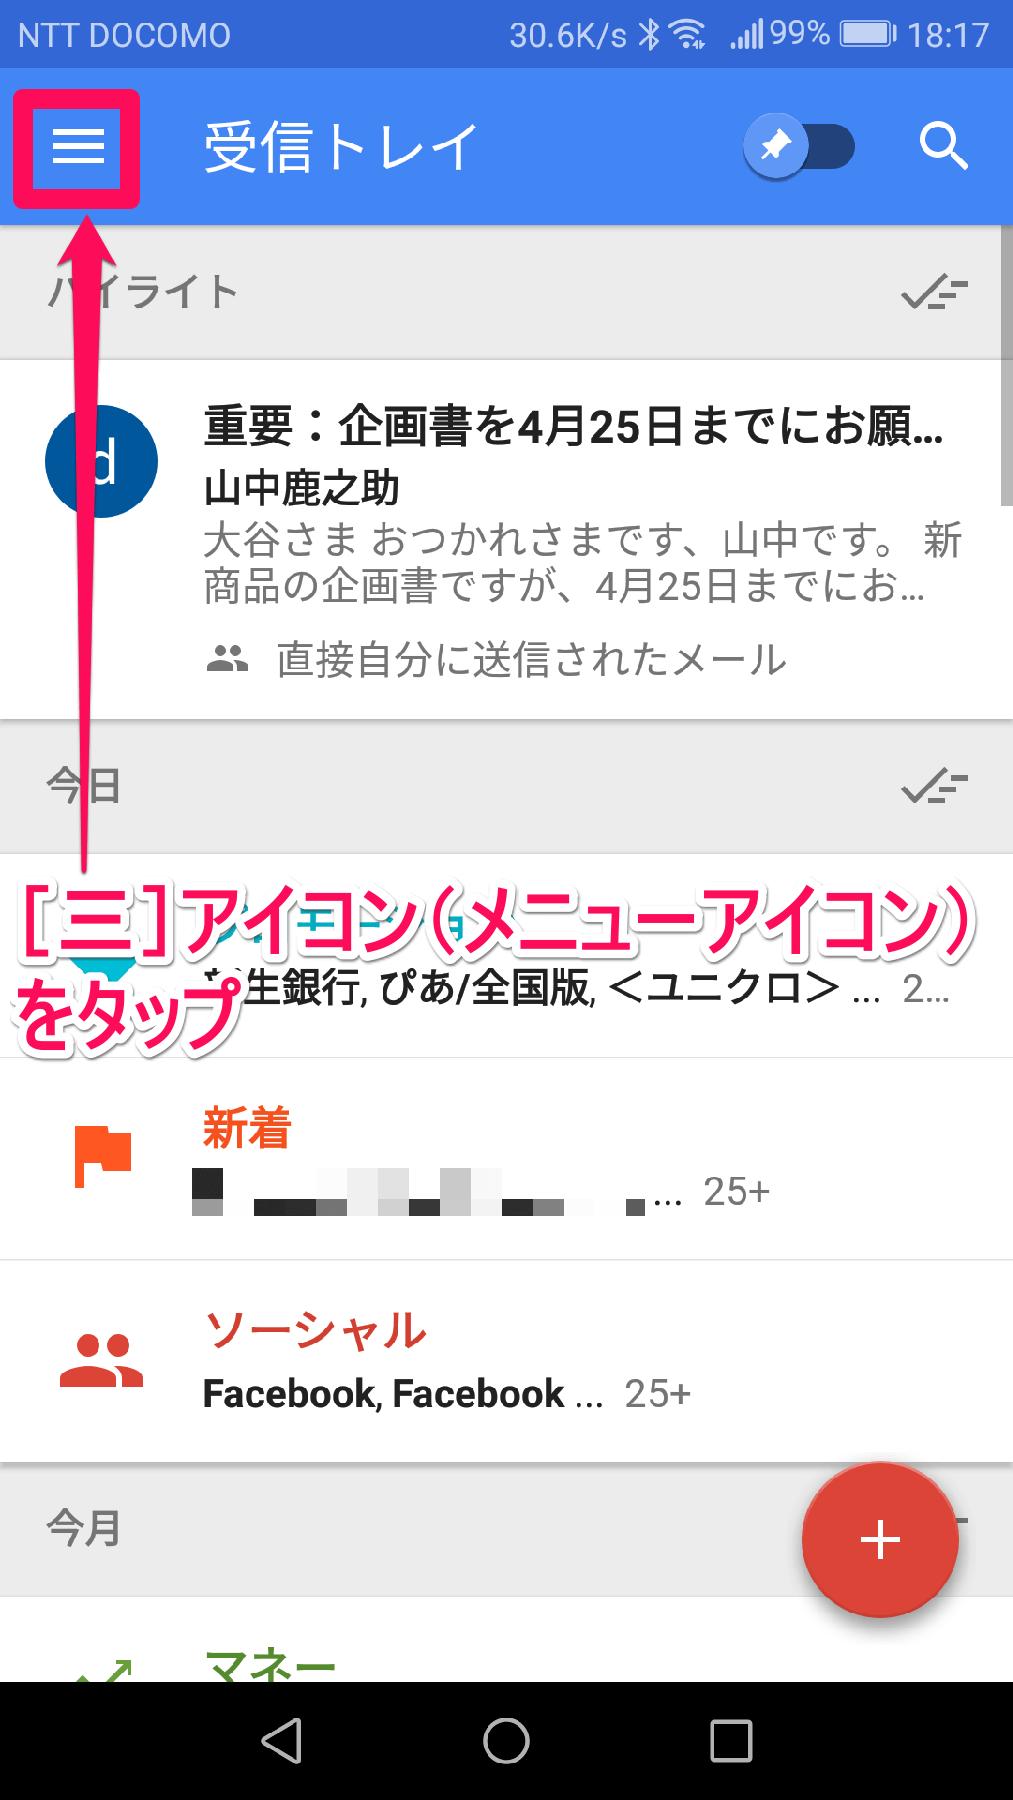 Inbox by Gmail(インボックス、ジーメール)のメイン画面(メニューアイコンをタップする画面)